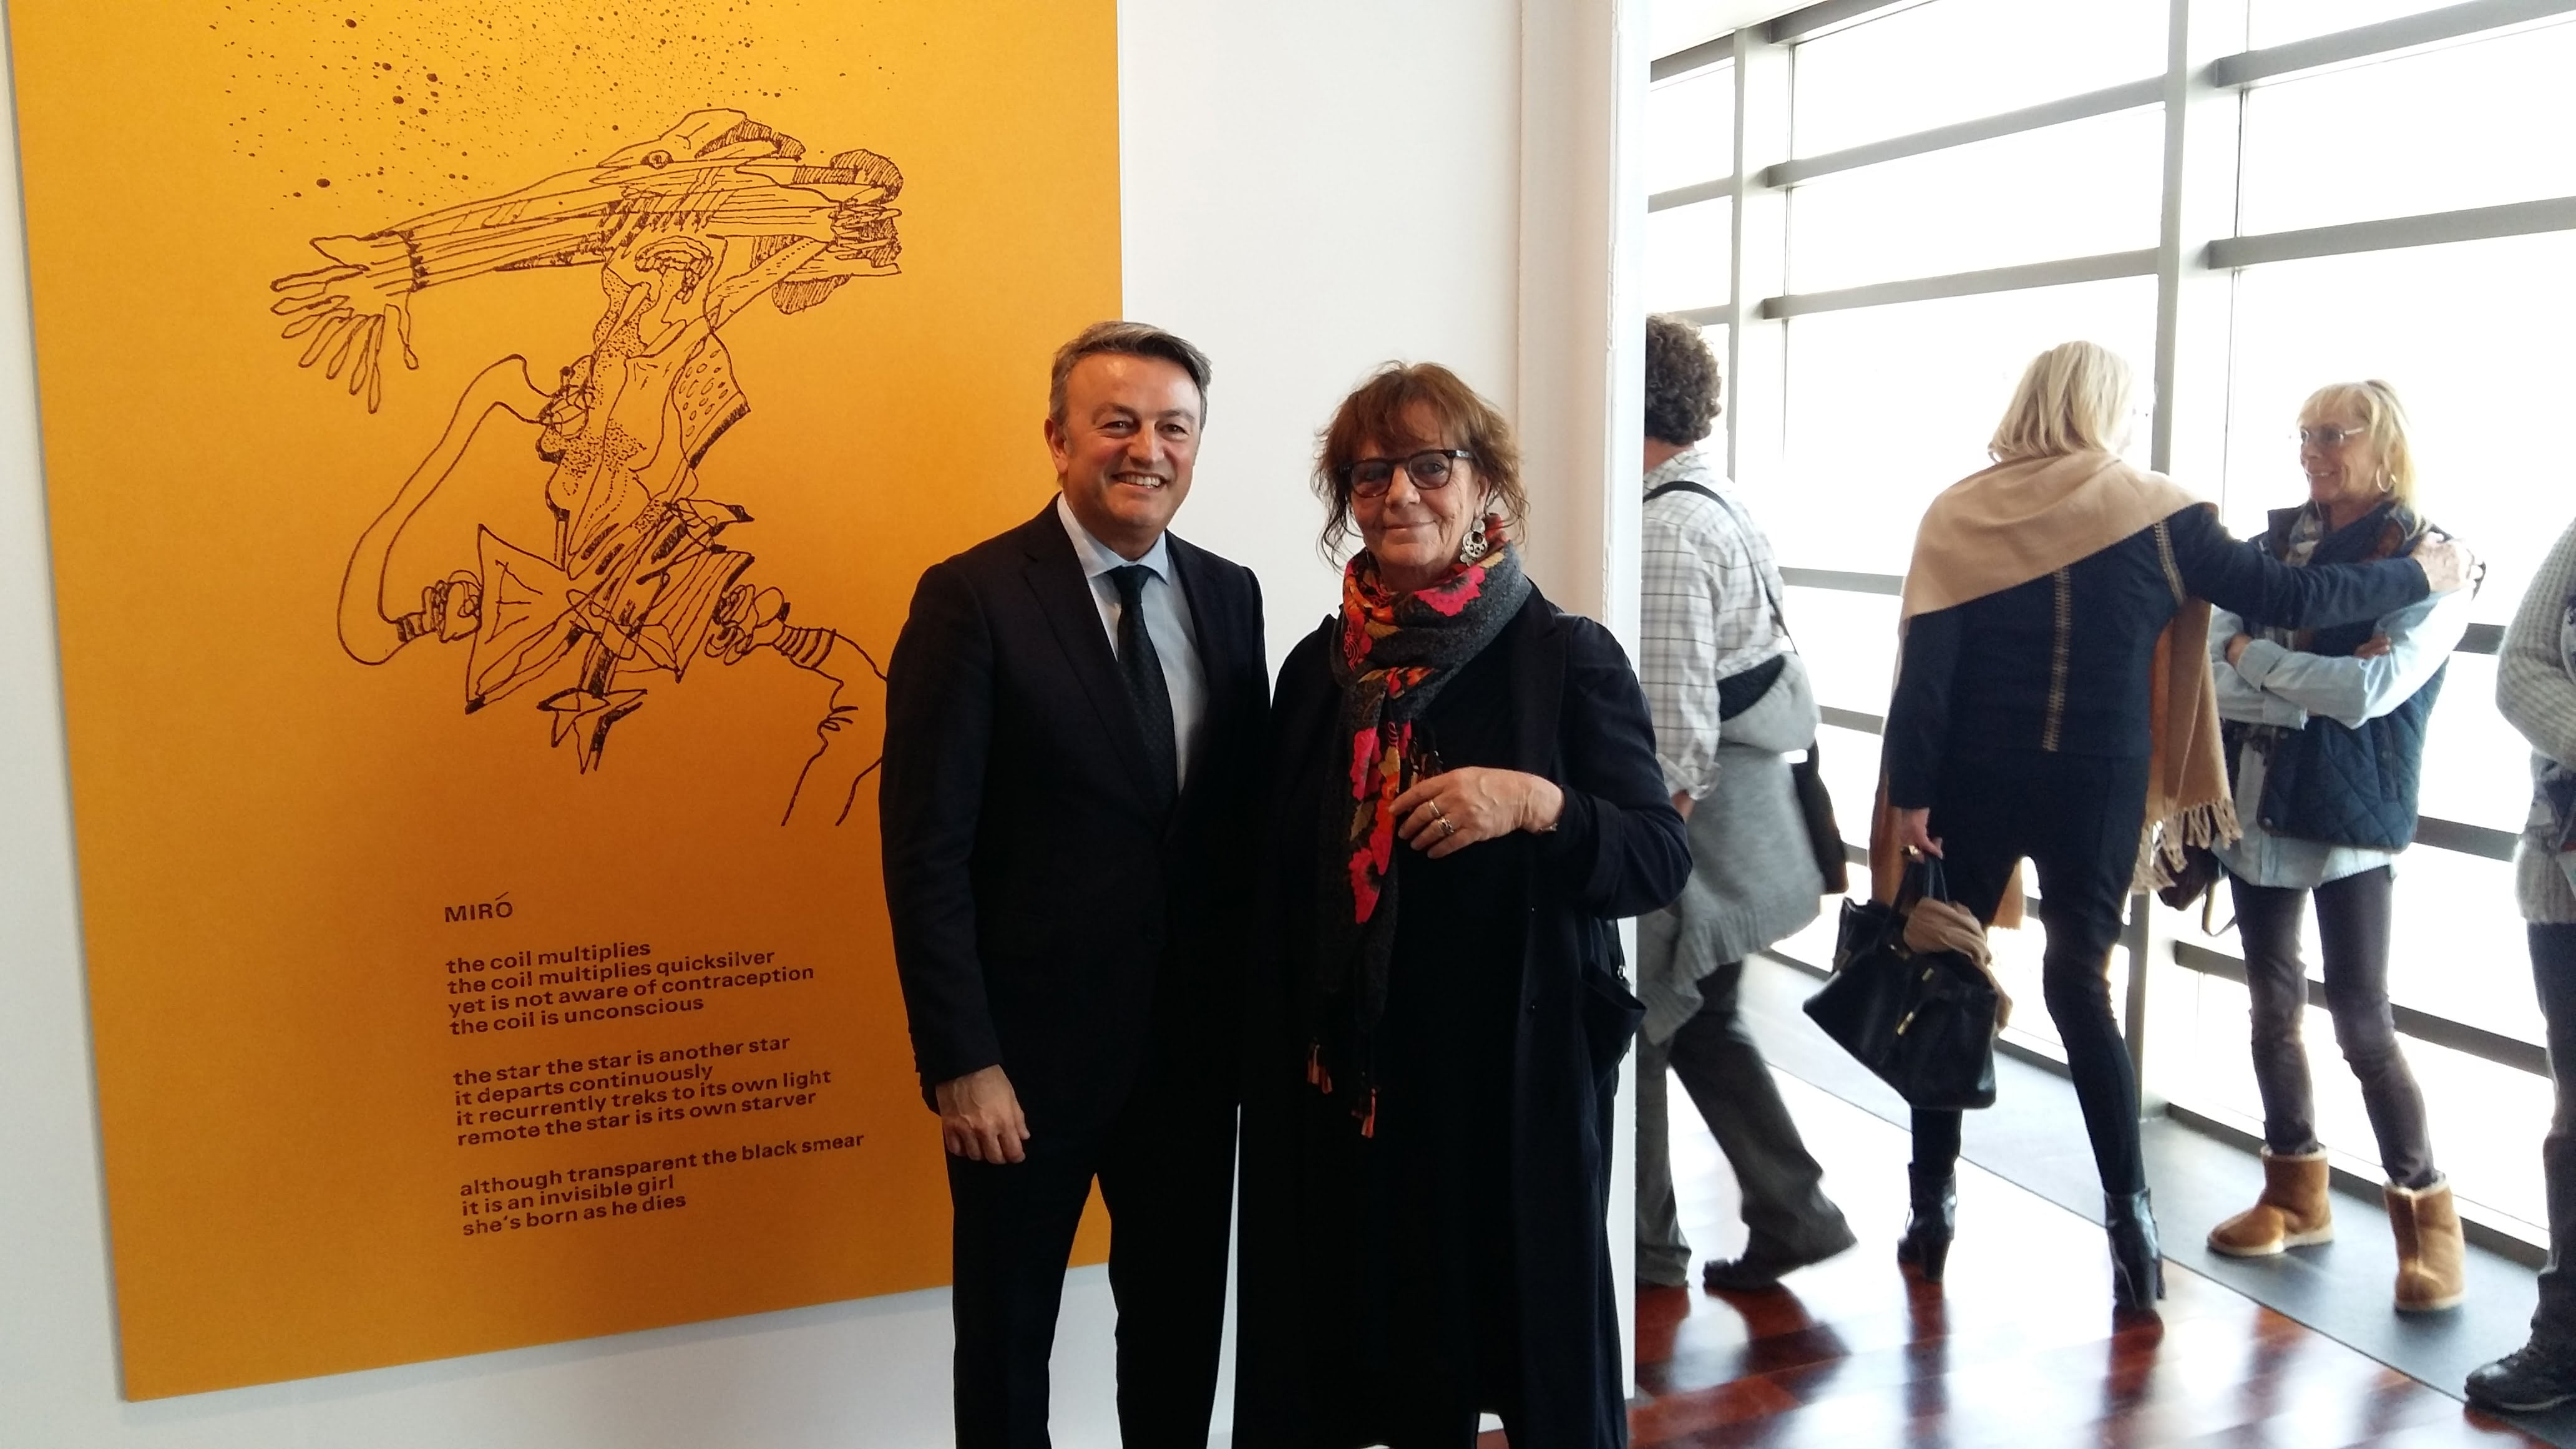 Inauguración Lucebert. Alcalde con la Noa, hija del artista